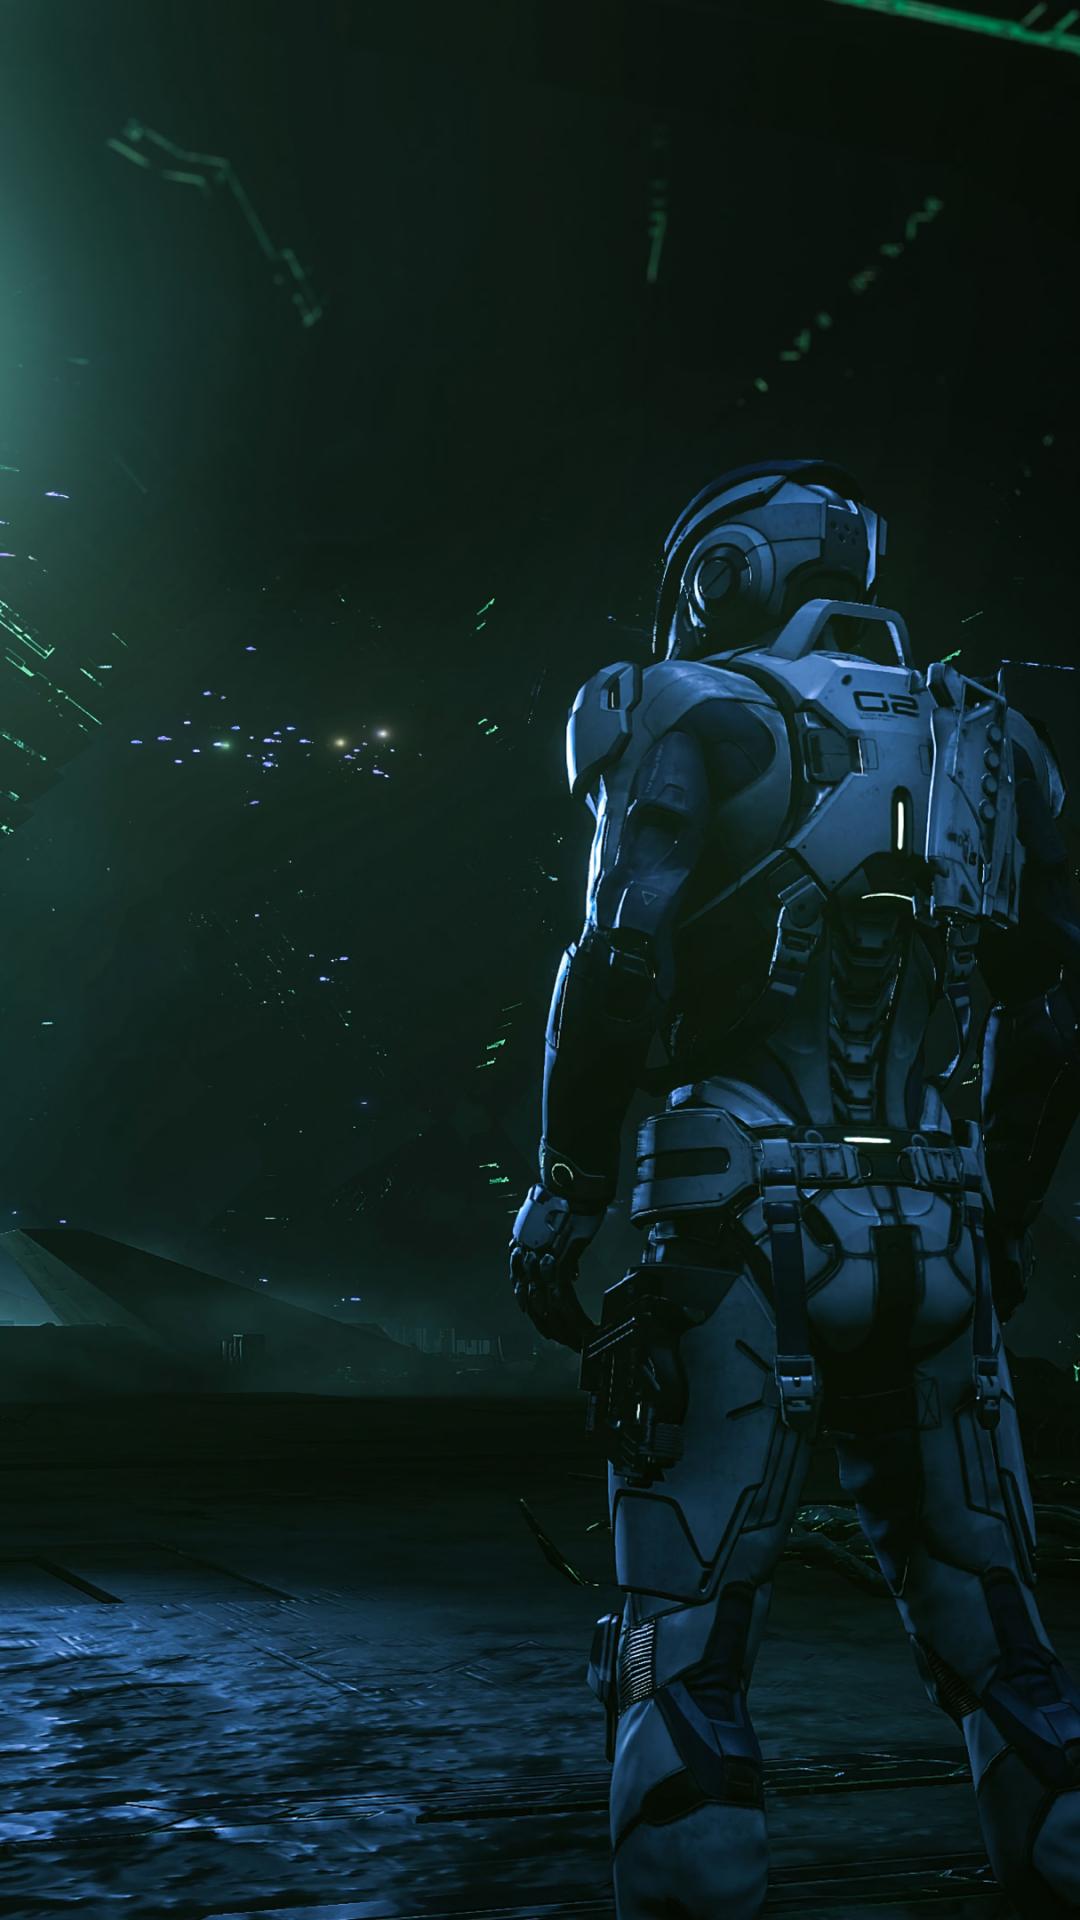 Mass Effect Andromeda Wallpaper Full Hd Game Wallpaper Hd